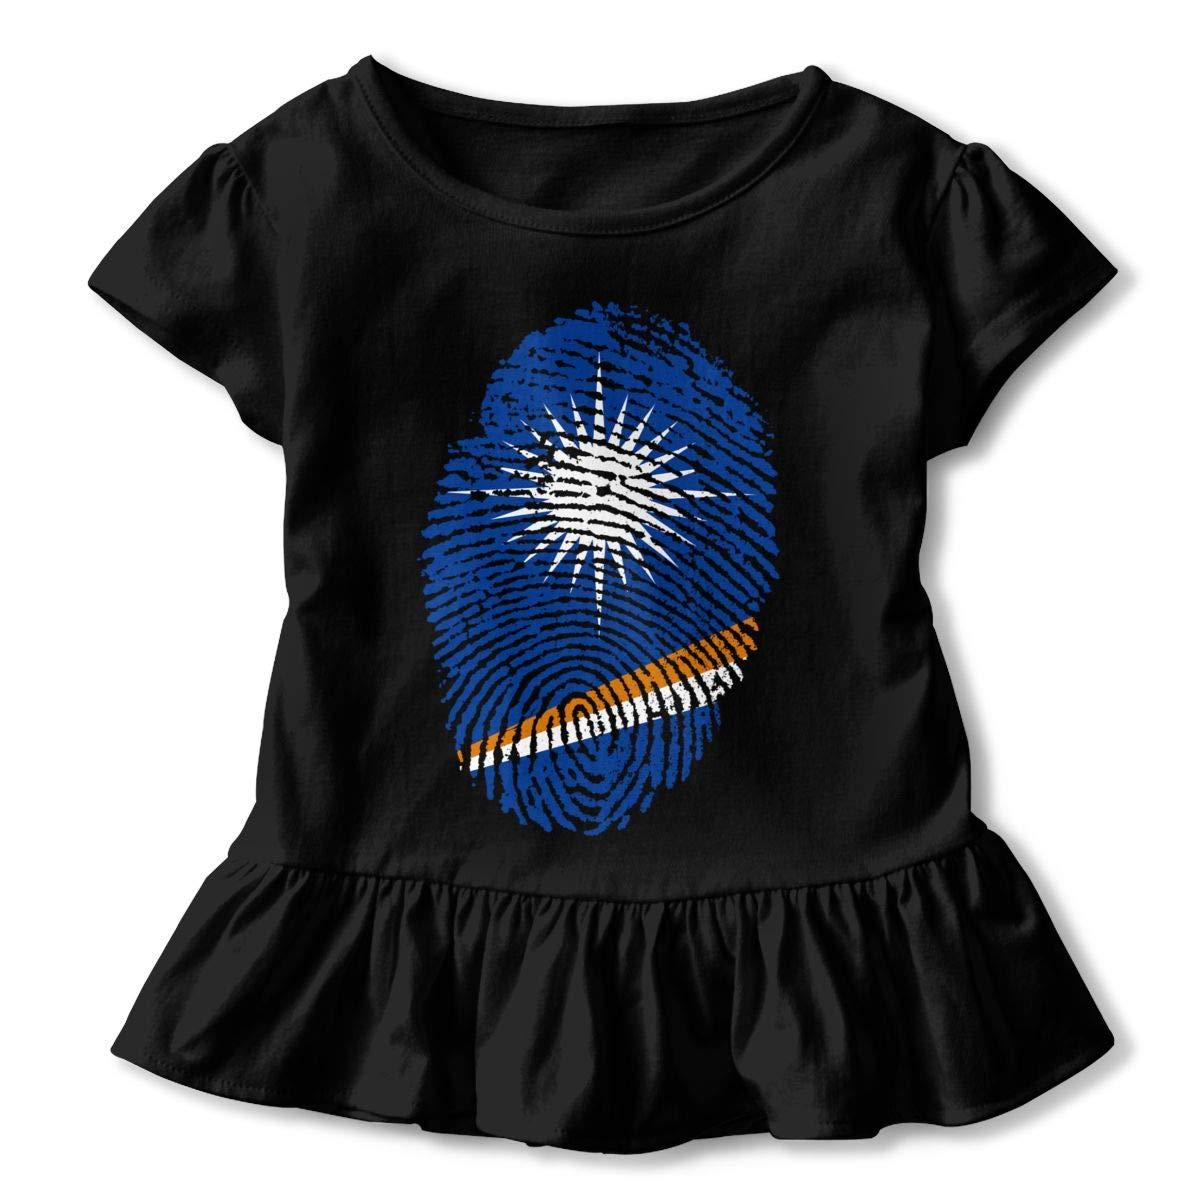 JVNSS Fingerprint Marshall Islands Shirt Printed Infant Girl Flounced T Shirts Cotton Tops for 2-6T Baby Girls